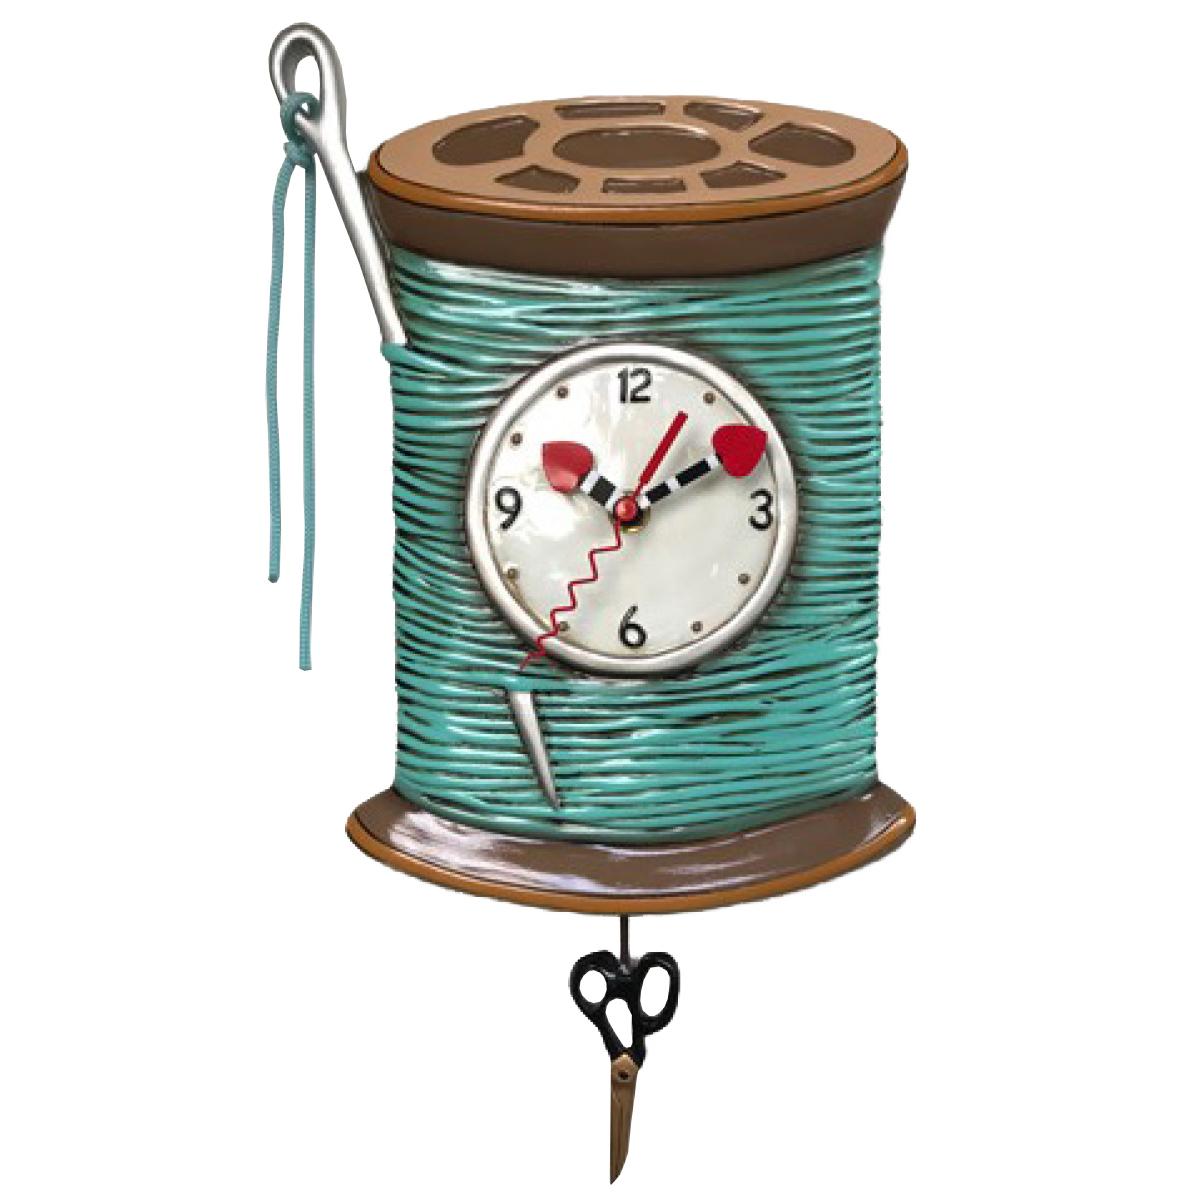 Horloge Murale \'Allen Designs\' turquoise marron (couture) - 26x155 cm - [Q1995]